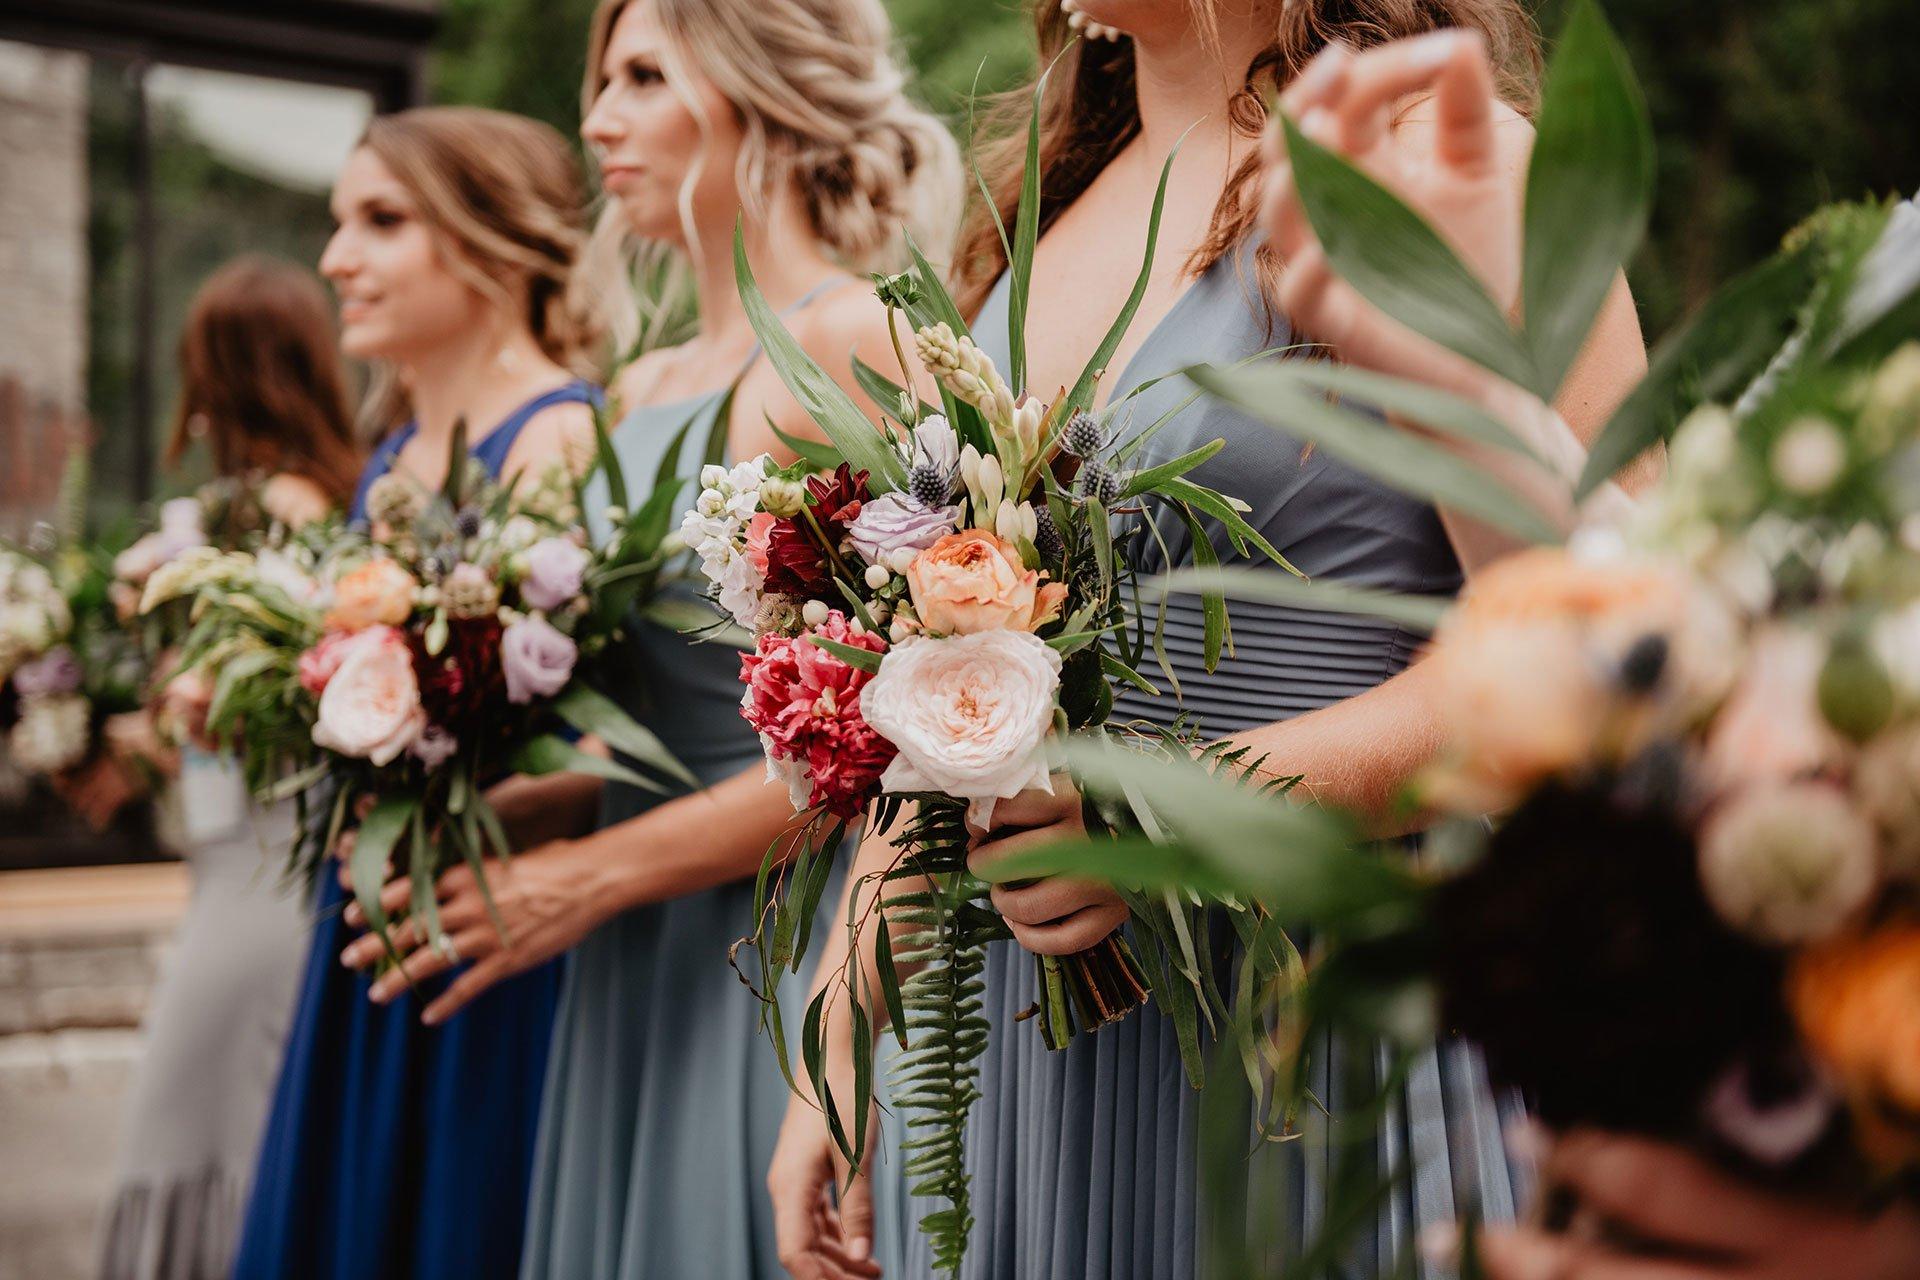 Women Holding Wedding Flowers